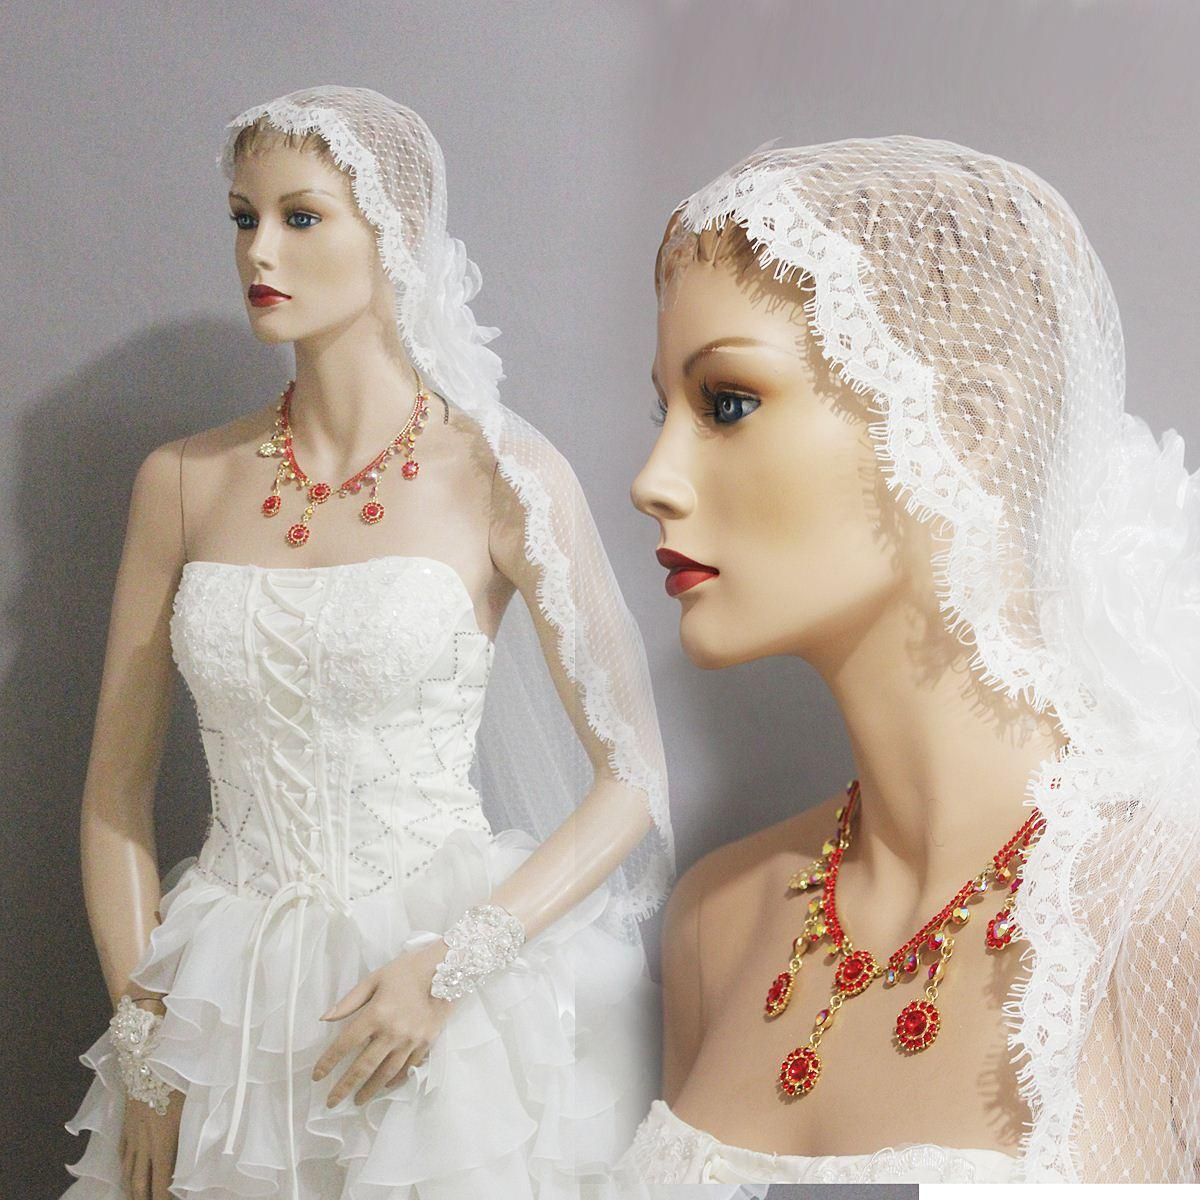 2015bean Point Gauze Flowers Wedding Veil Bridal Flower Shape Modular Fashion Short Veils Melbourne Sydney From